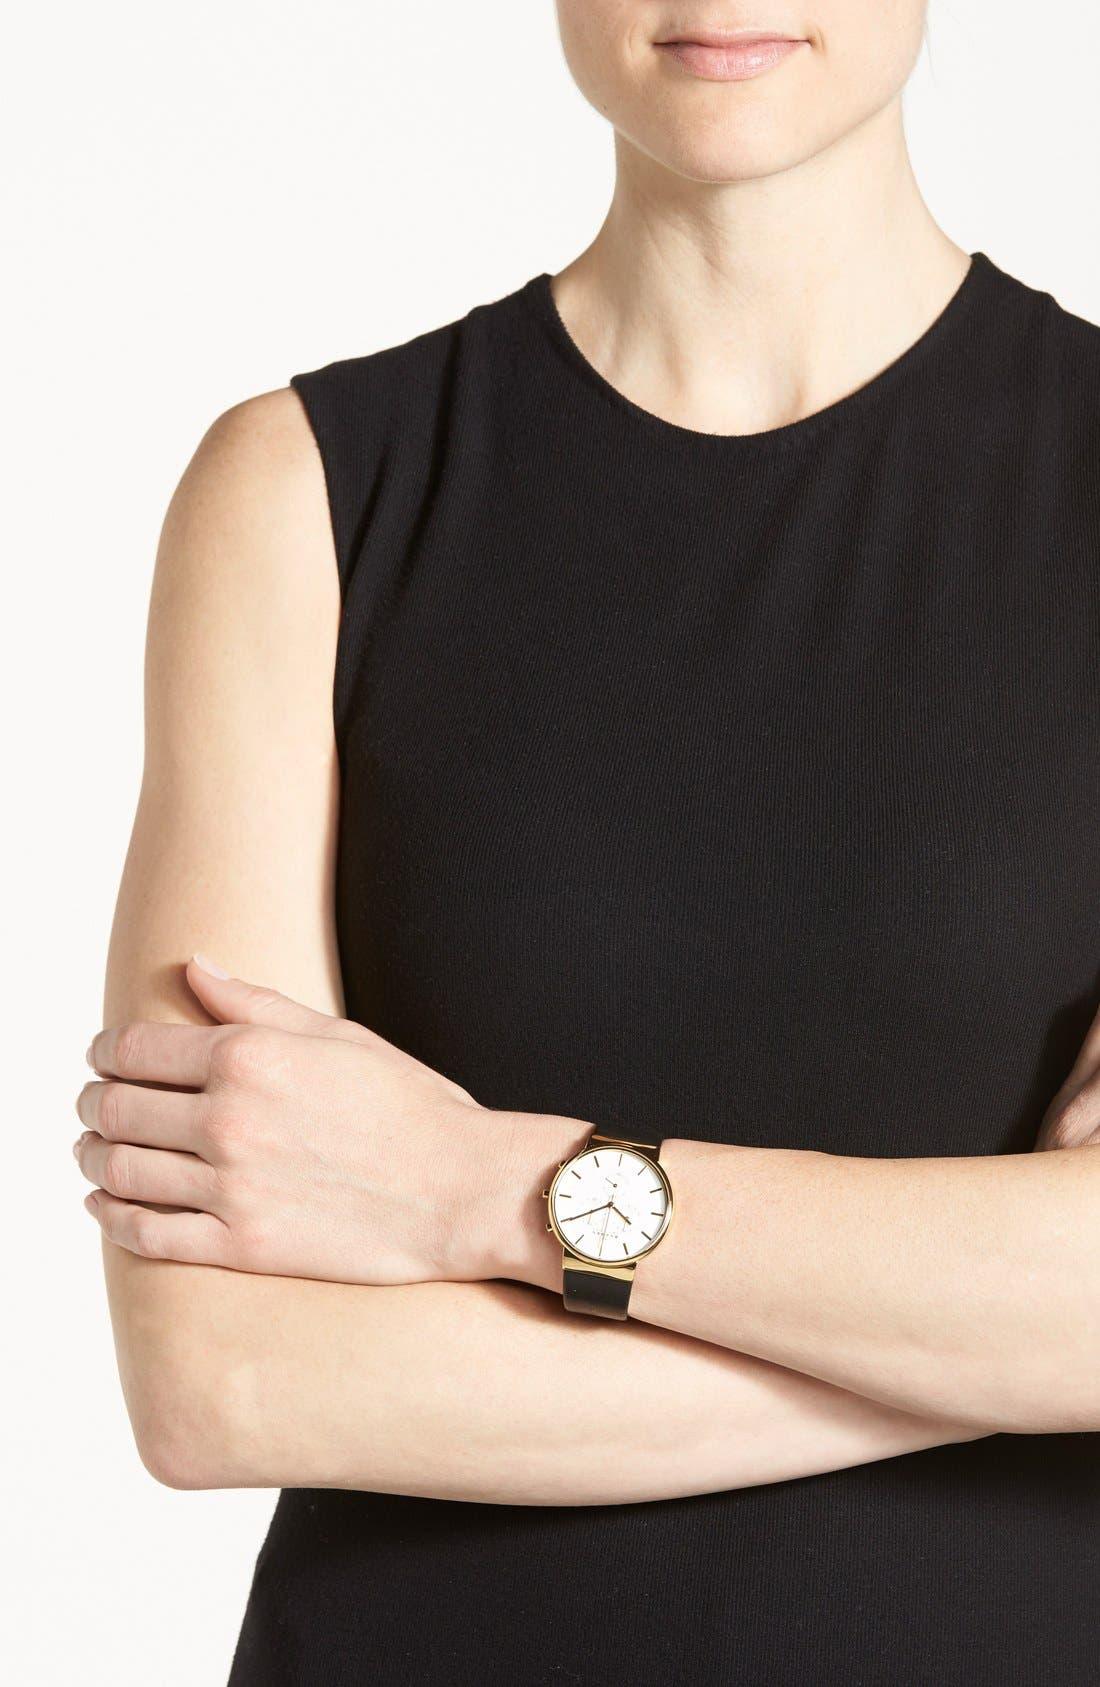 Alternate Image 4  - Skagen 'Ancher' Chronograph Leather Strap Watch, 40mm